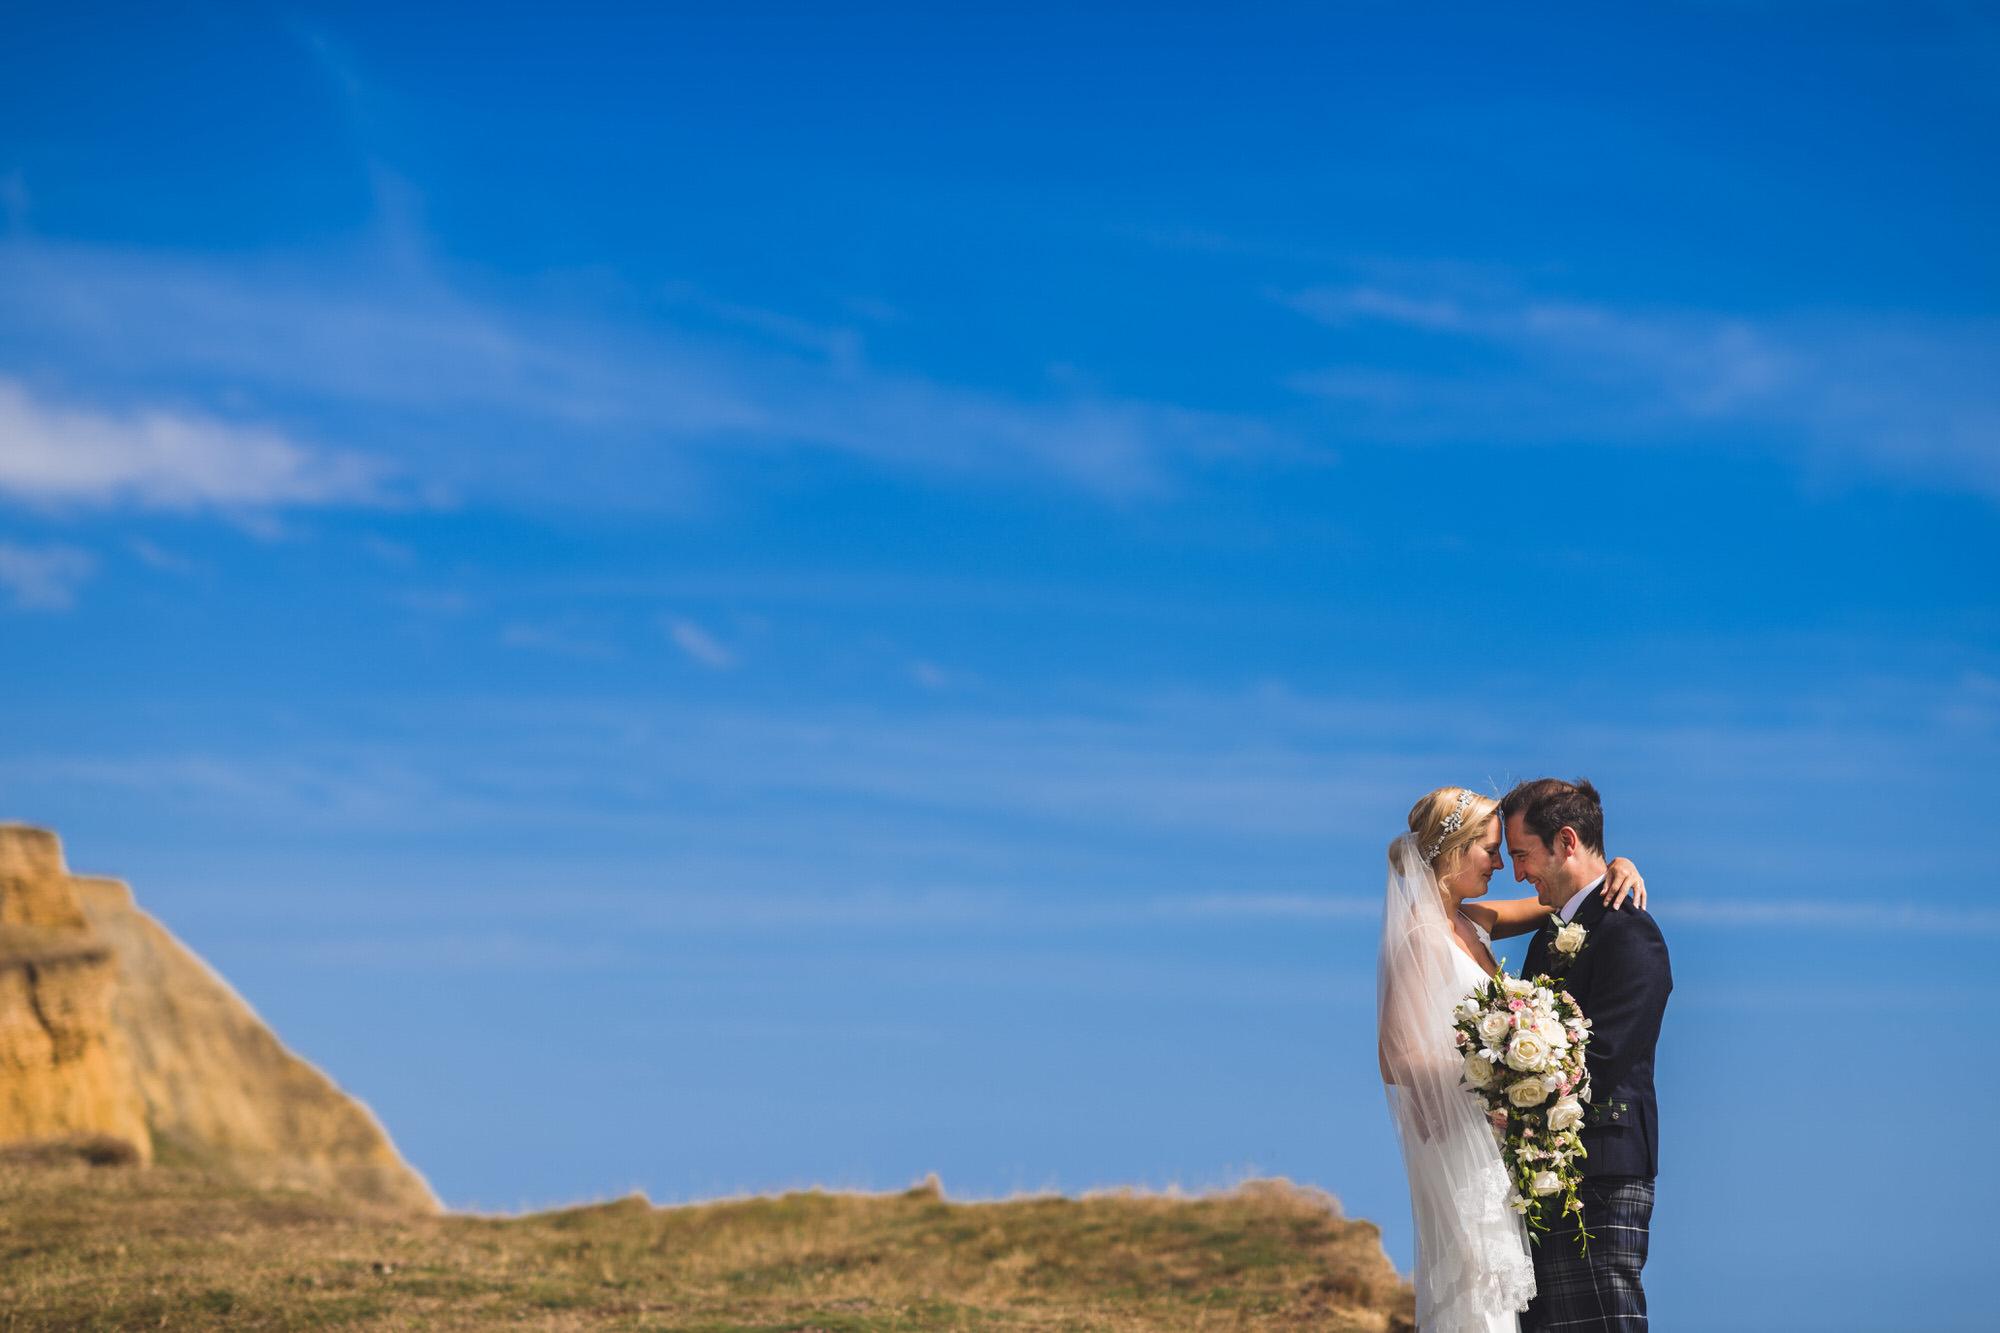 Dorset marquee wedding by the sea simon biffen photography 29